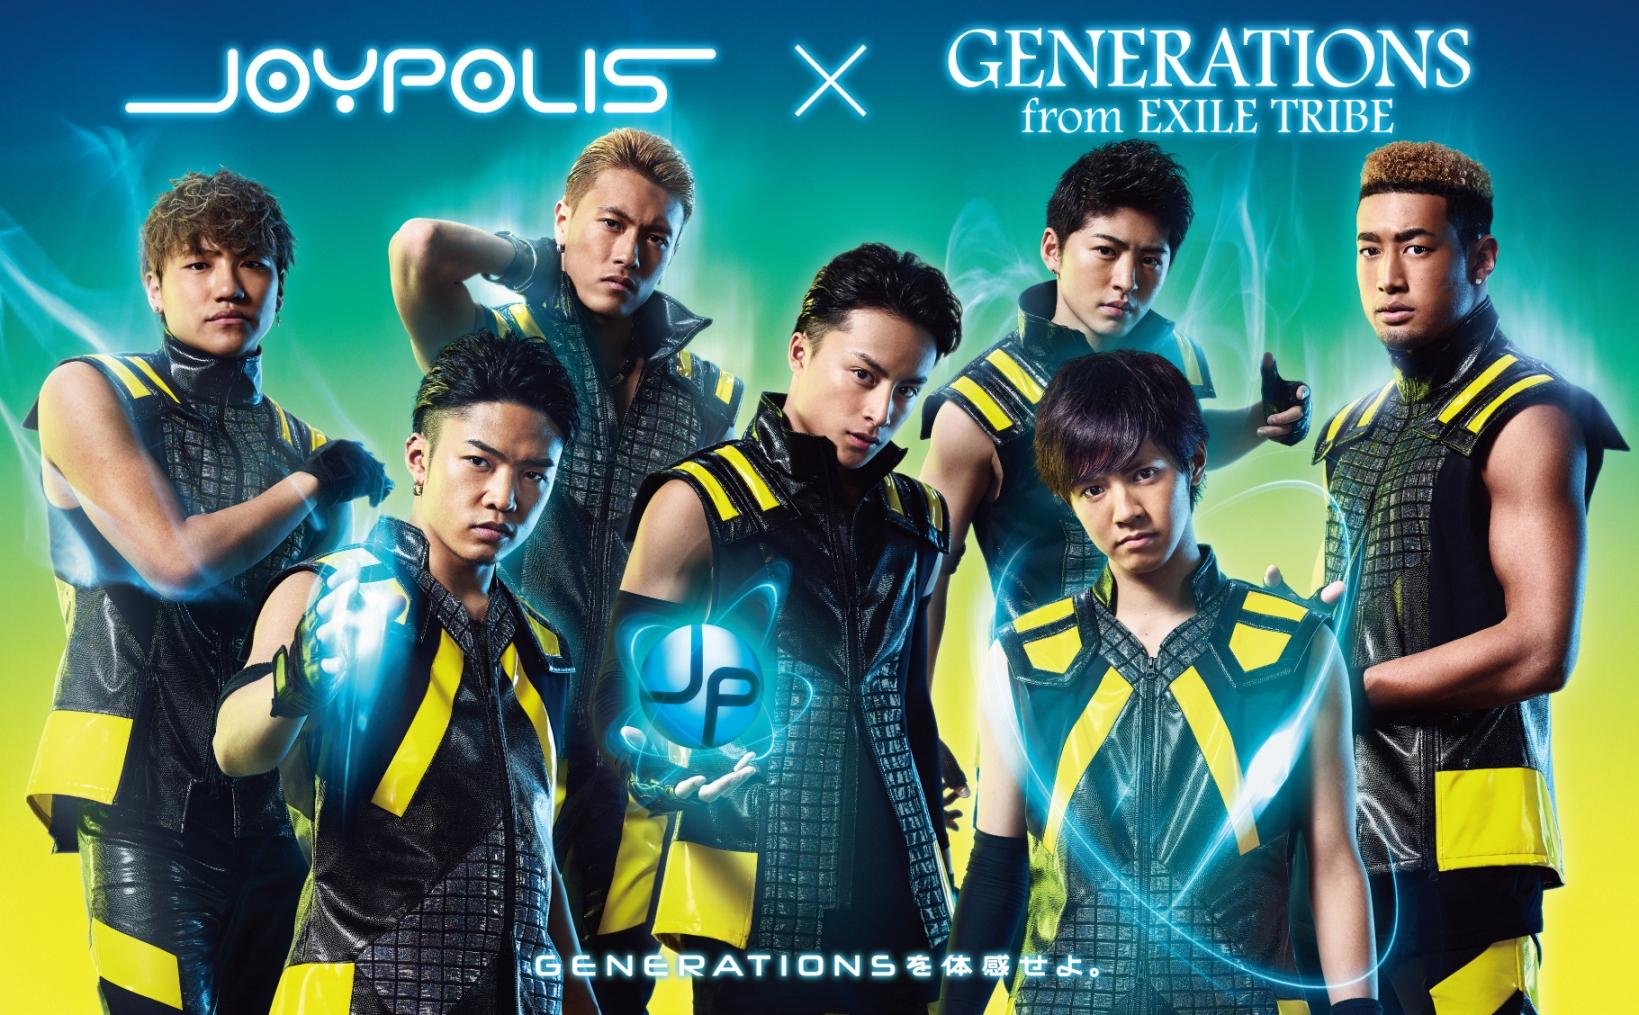 Joypolis Generations From Exile Tribe 株式会社セガのプレスリリース